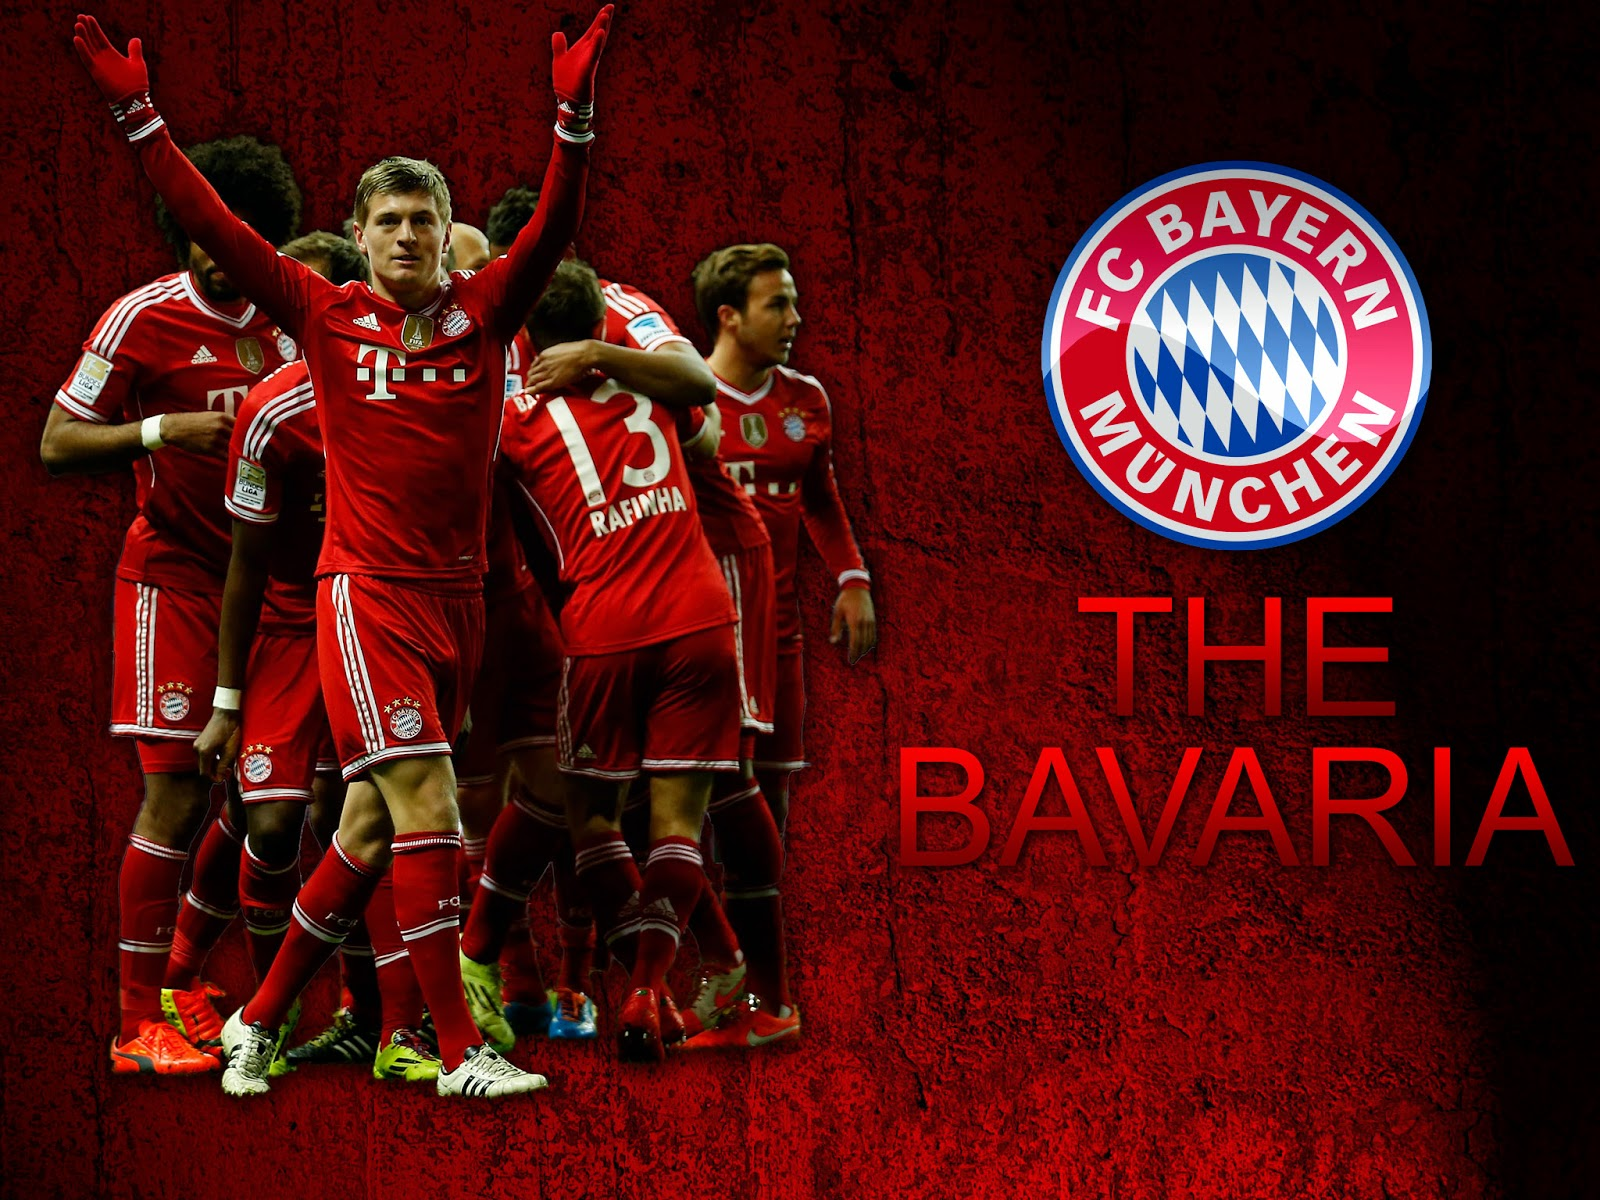 Fc Bayern Munich Wallpaper High Resolution: Bayern Munich IPhone Wallpaper